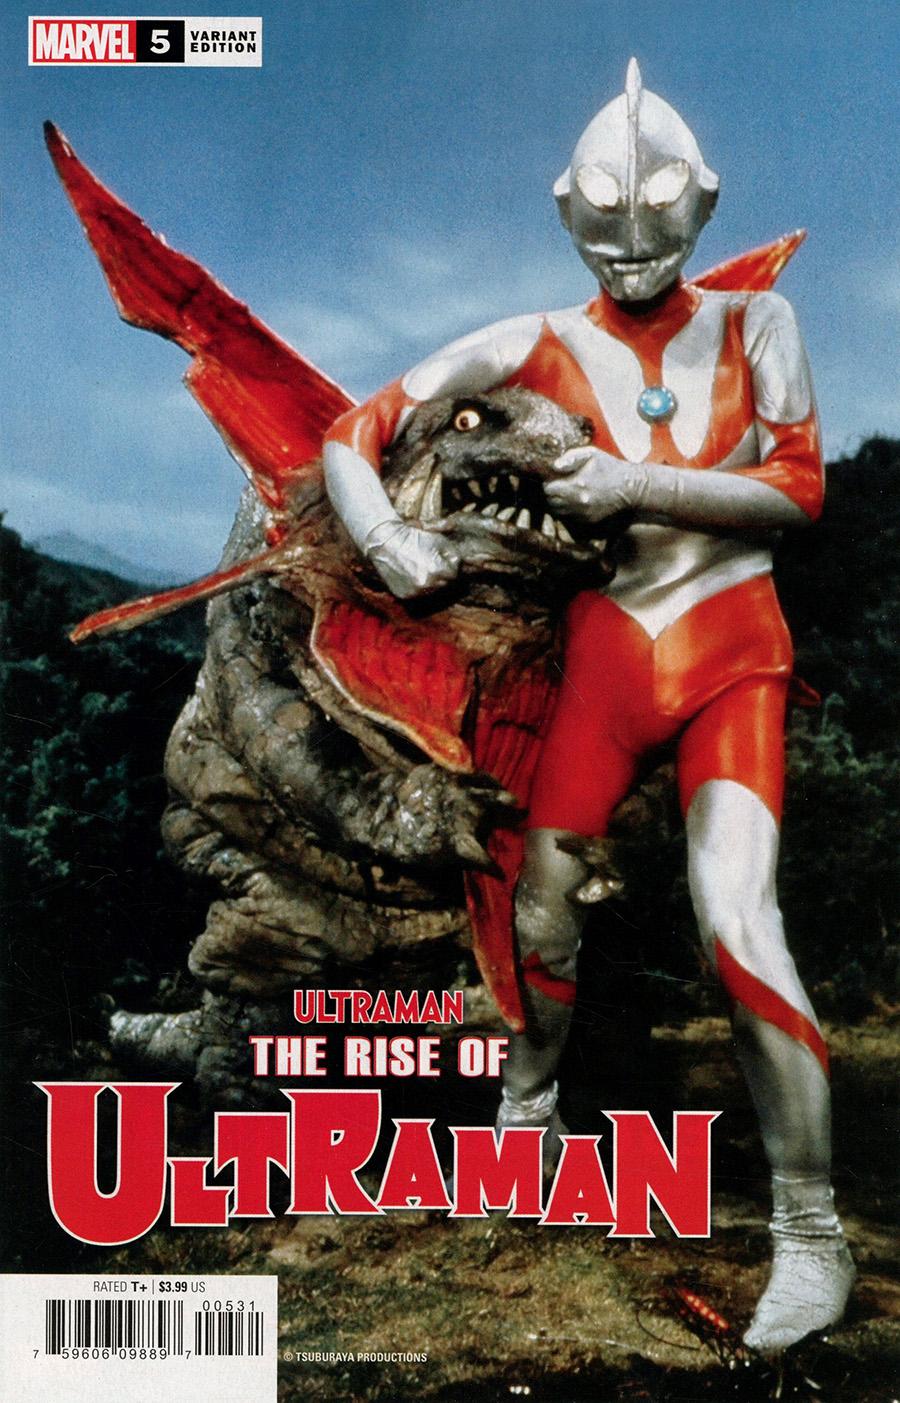 Ultraman Rise Of Ultraman #5 Cover B Variant Photo Cover